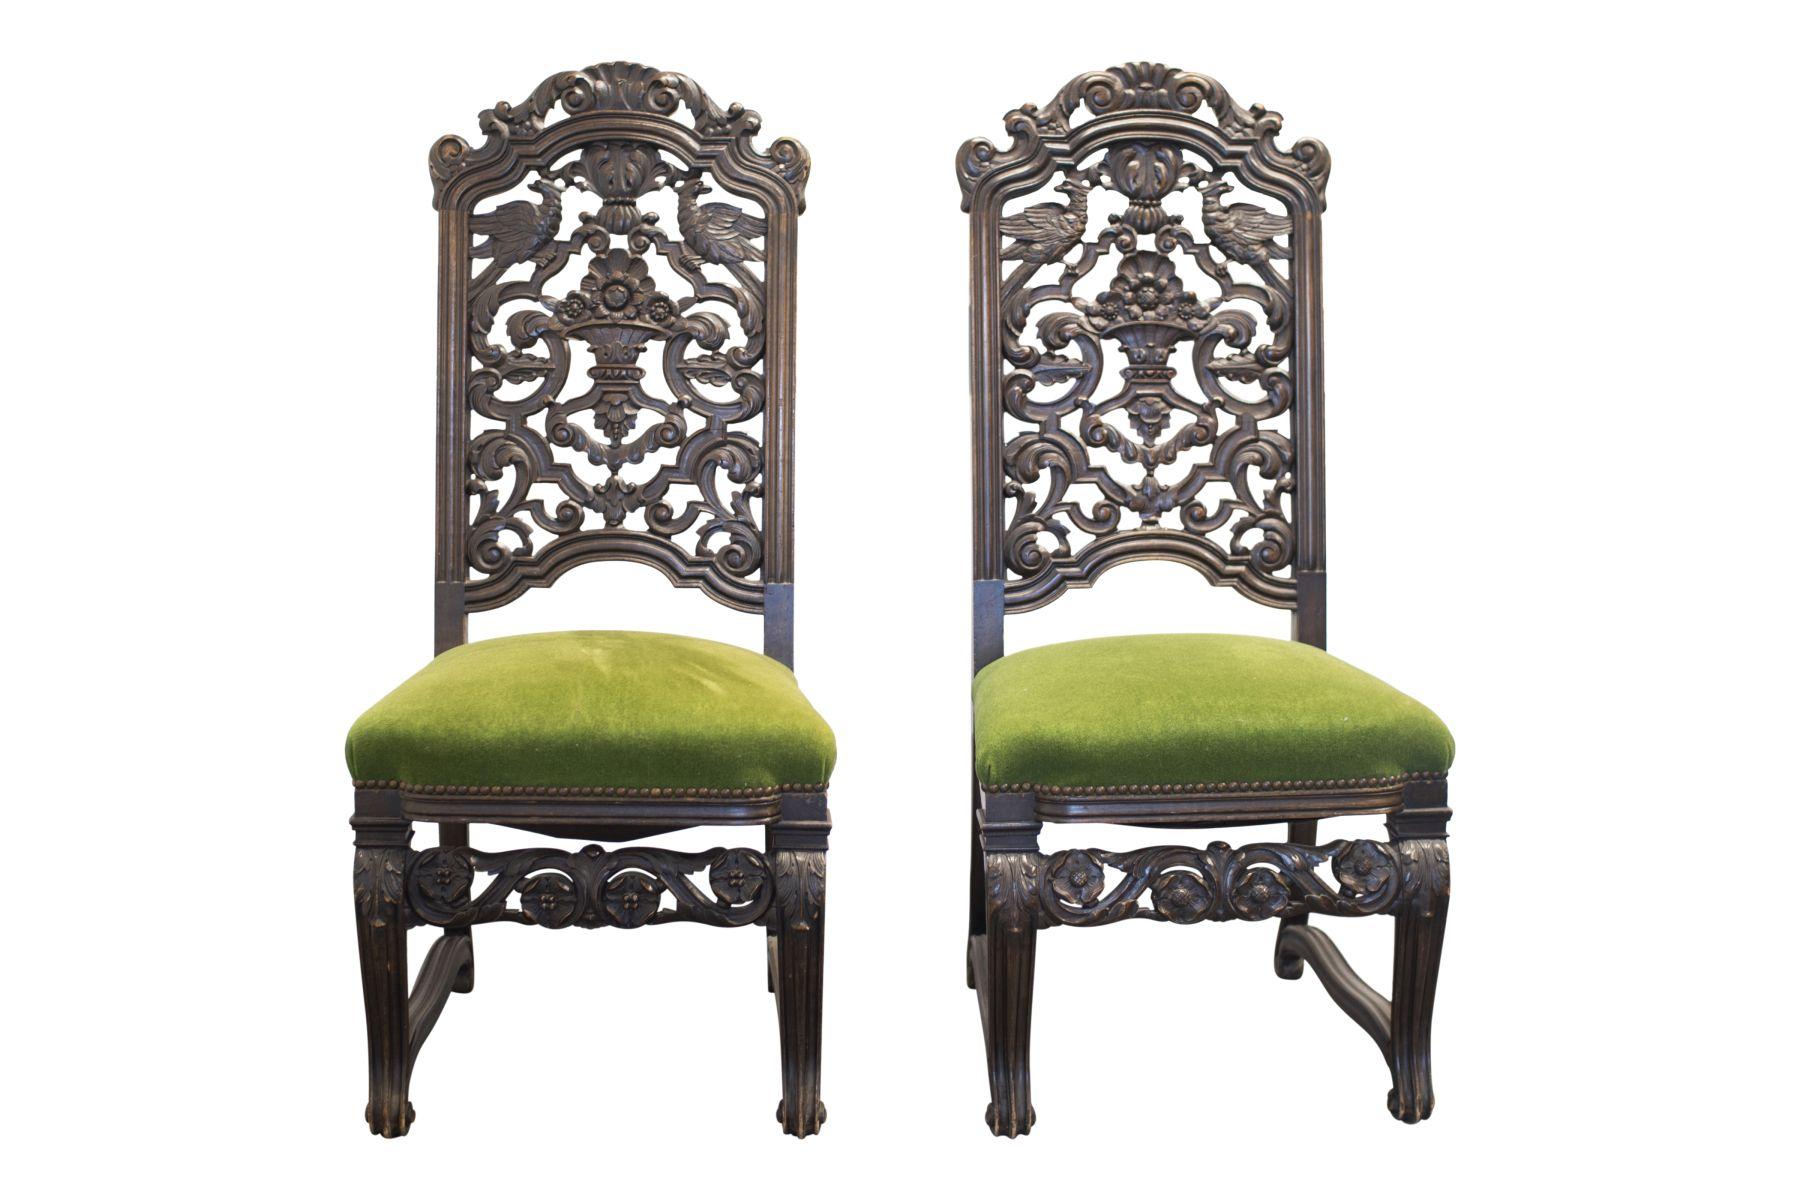 #26 Pair of Salon Chairs, Belle Epoque Style | Paar Salonstühle, Stil Belle Epoche Image